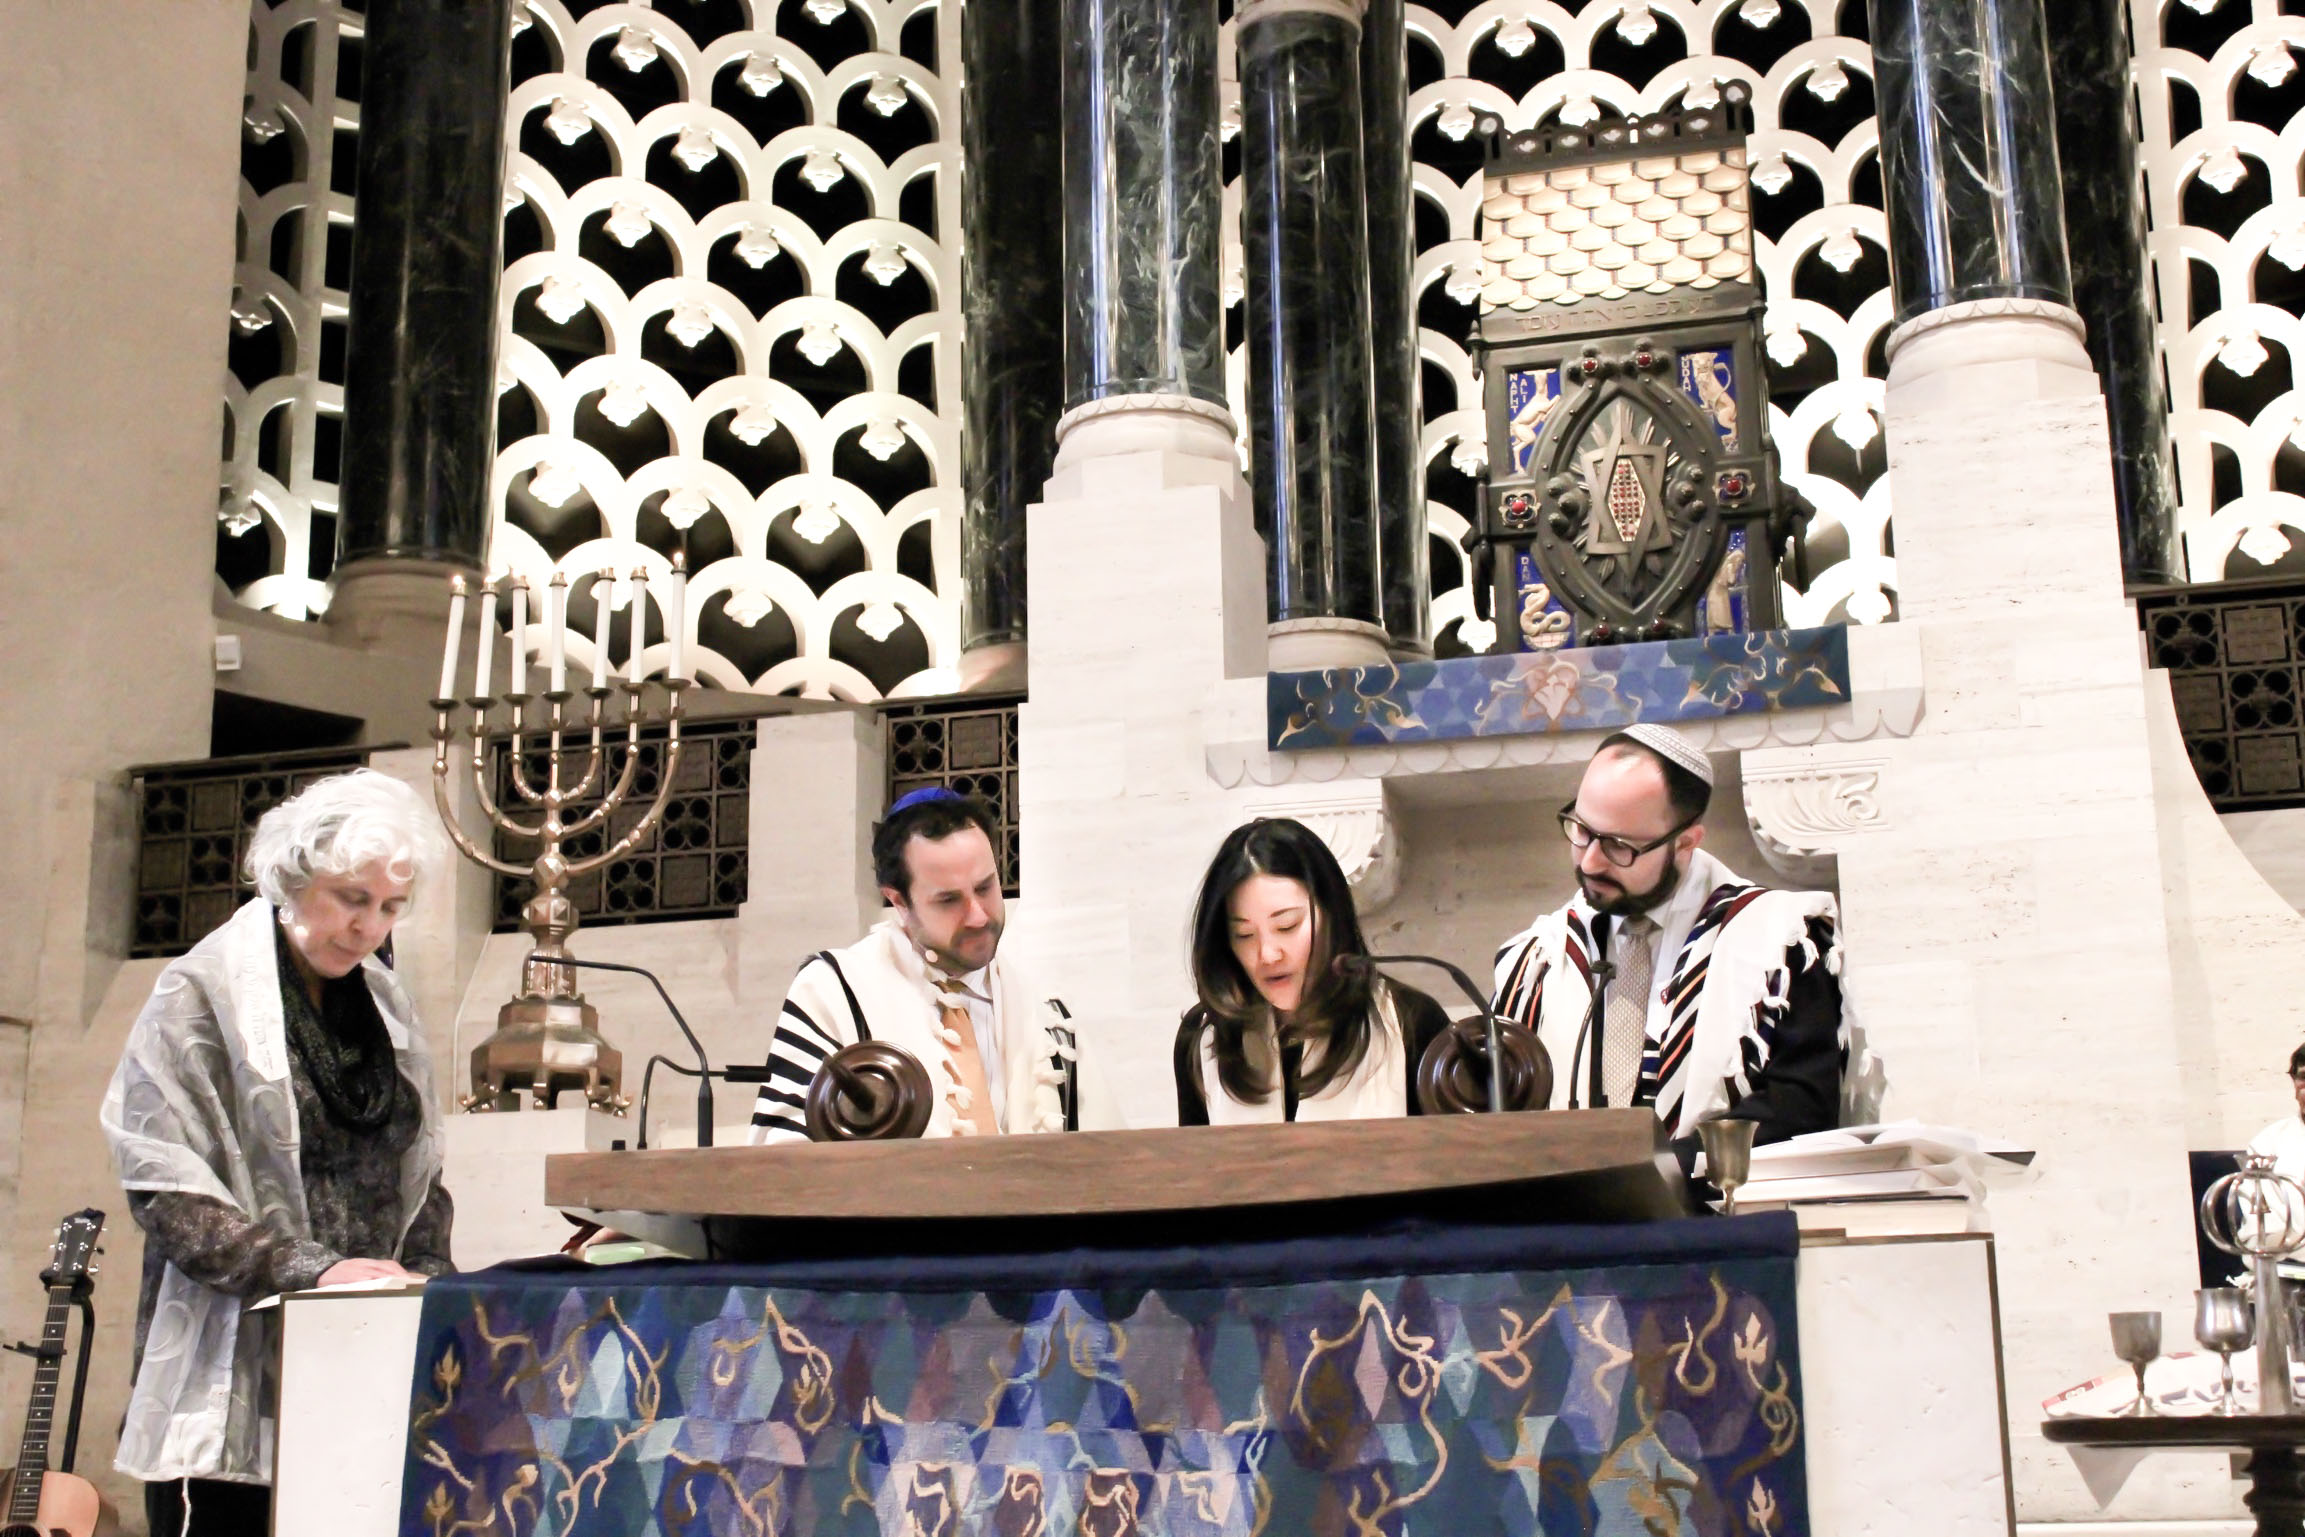 Kristin reading from the Torah